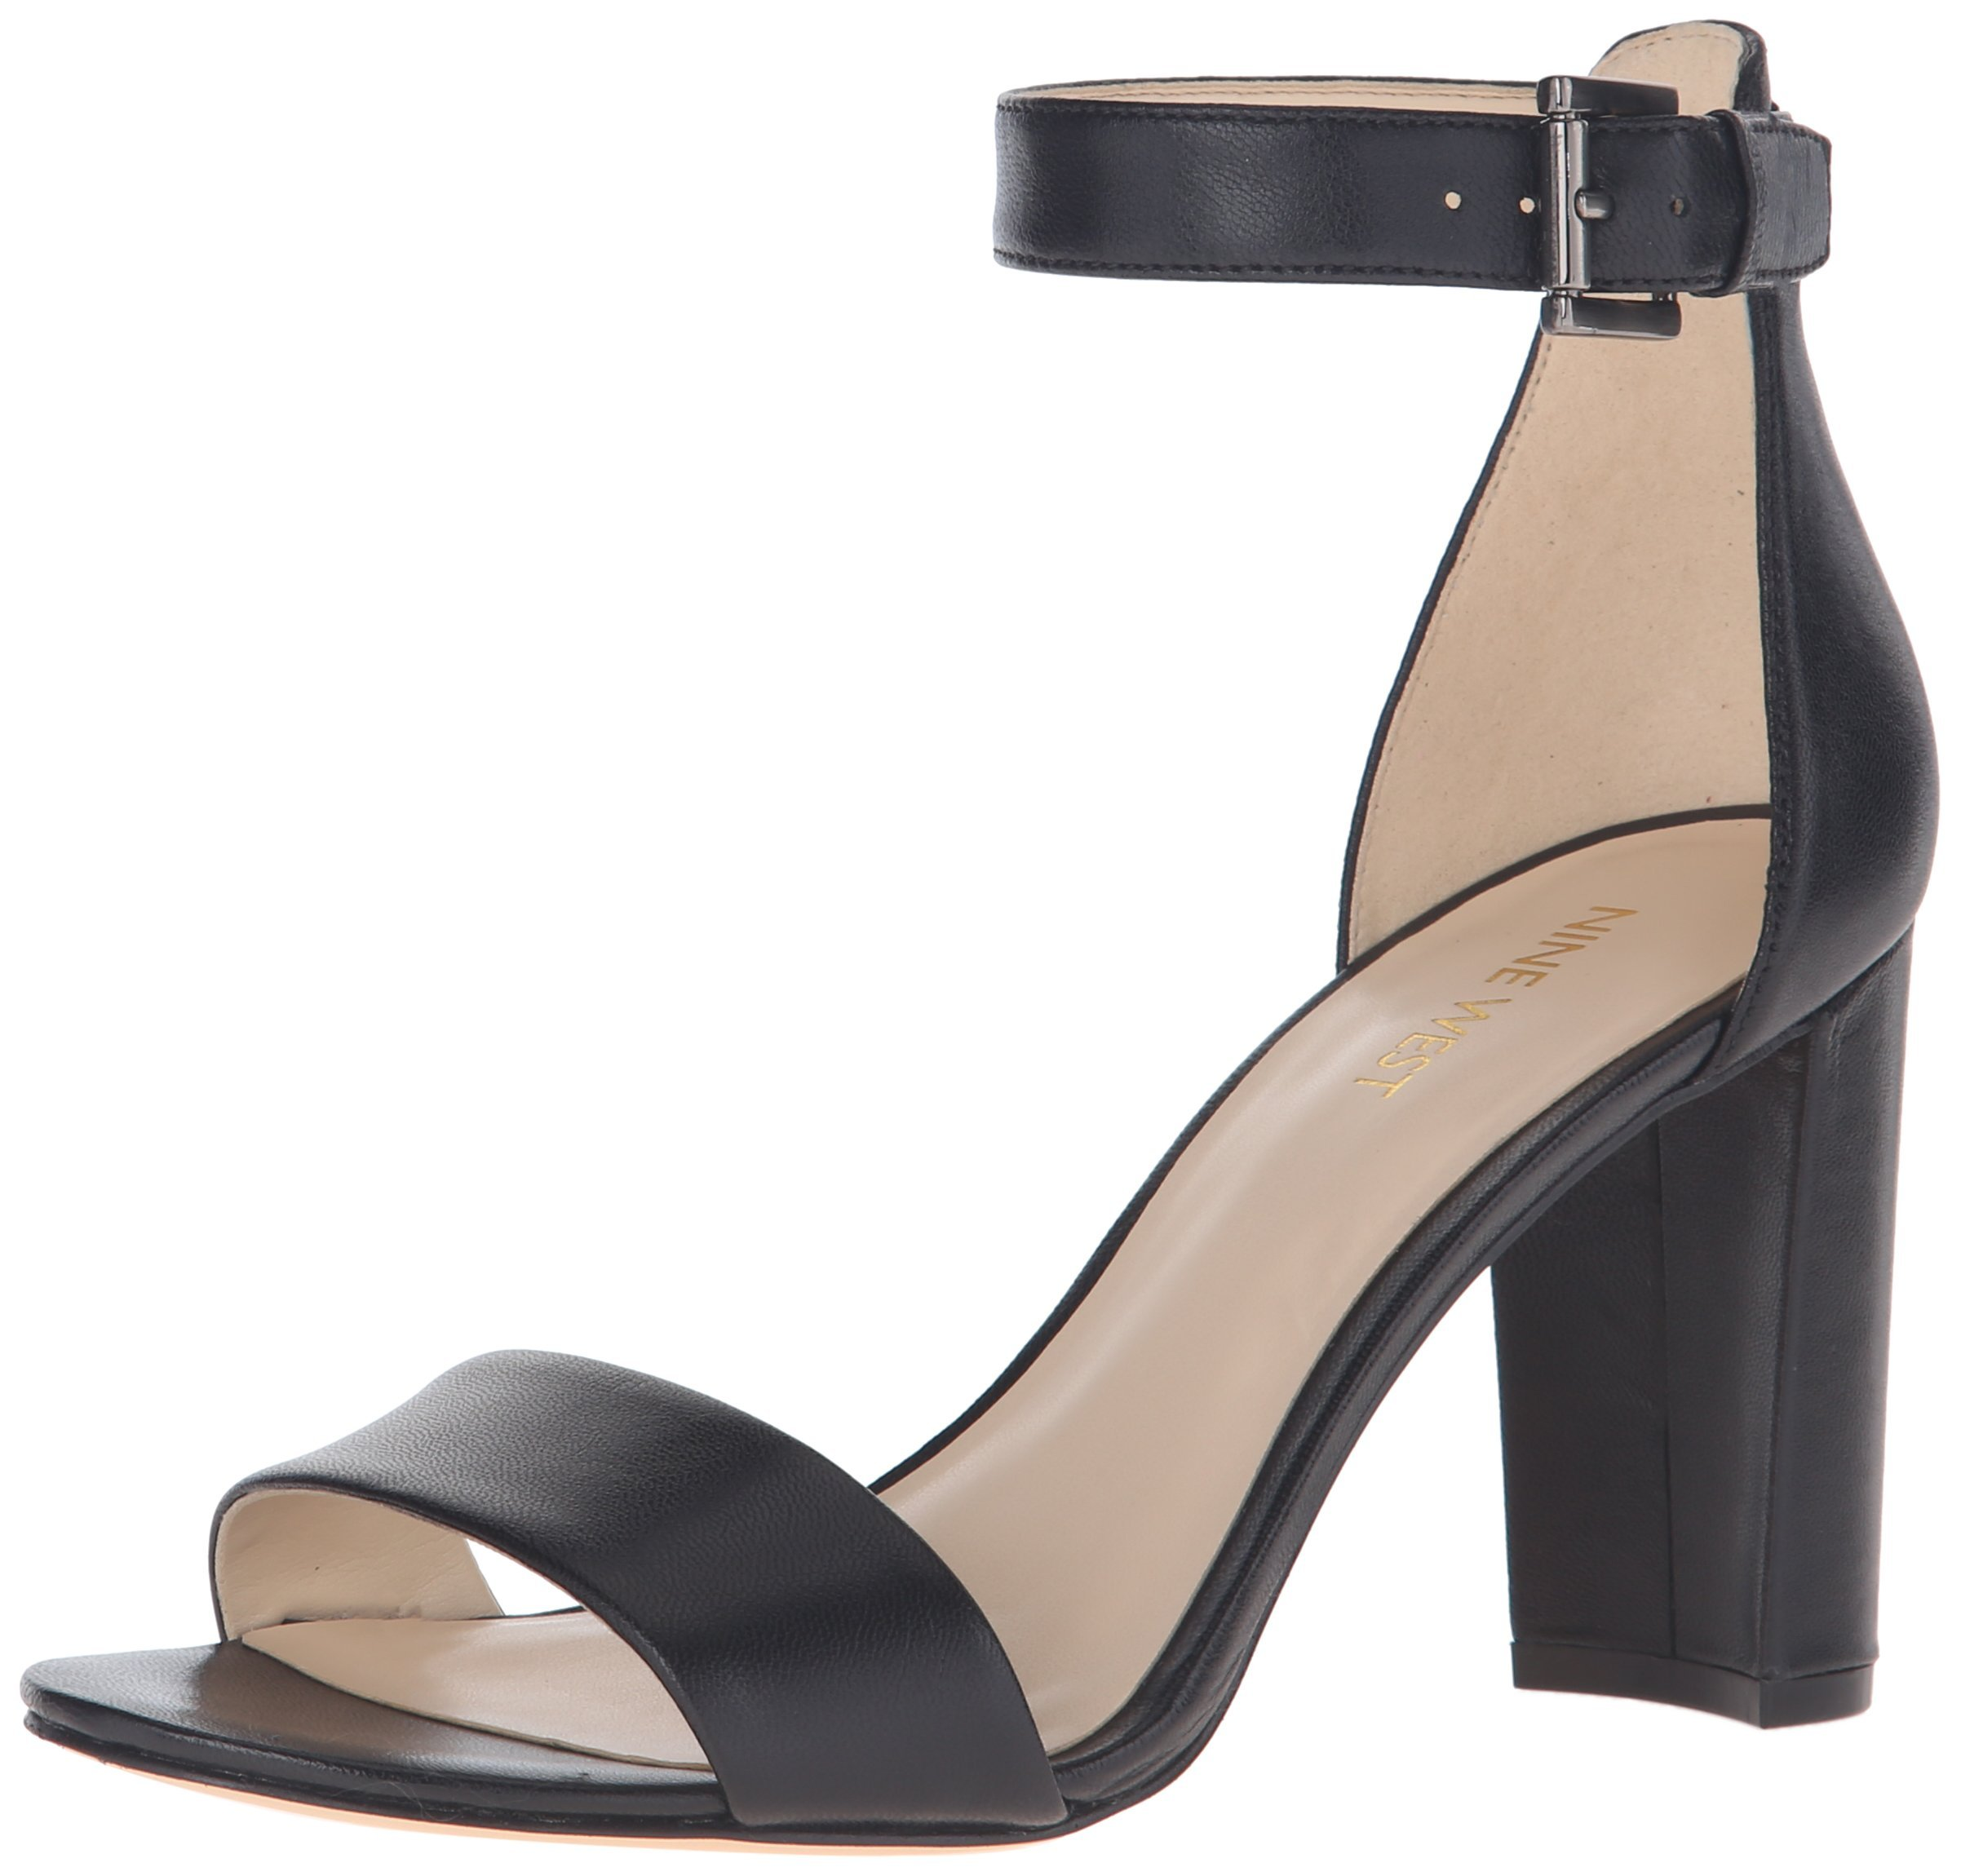 Nine West Women's Nora Leather Dress Sandal